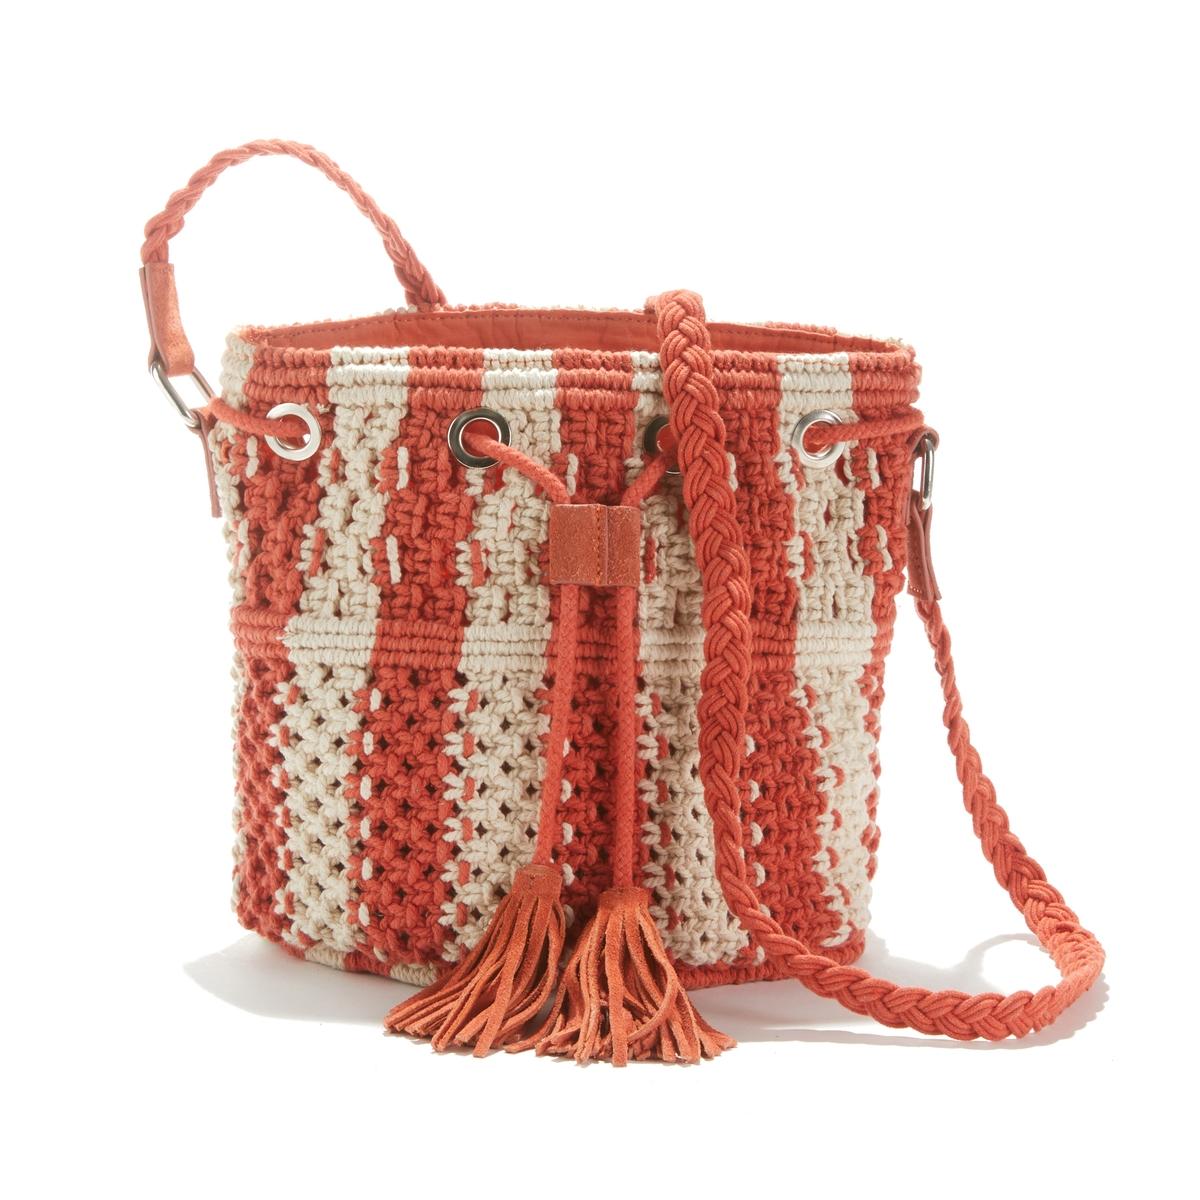 Сумка La Redoute Из макраме UNI оранжевый сумка с макраме